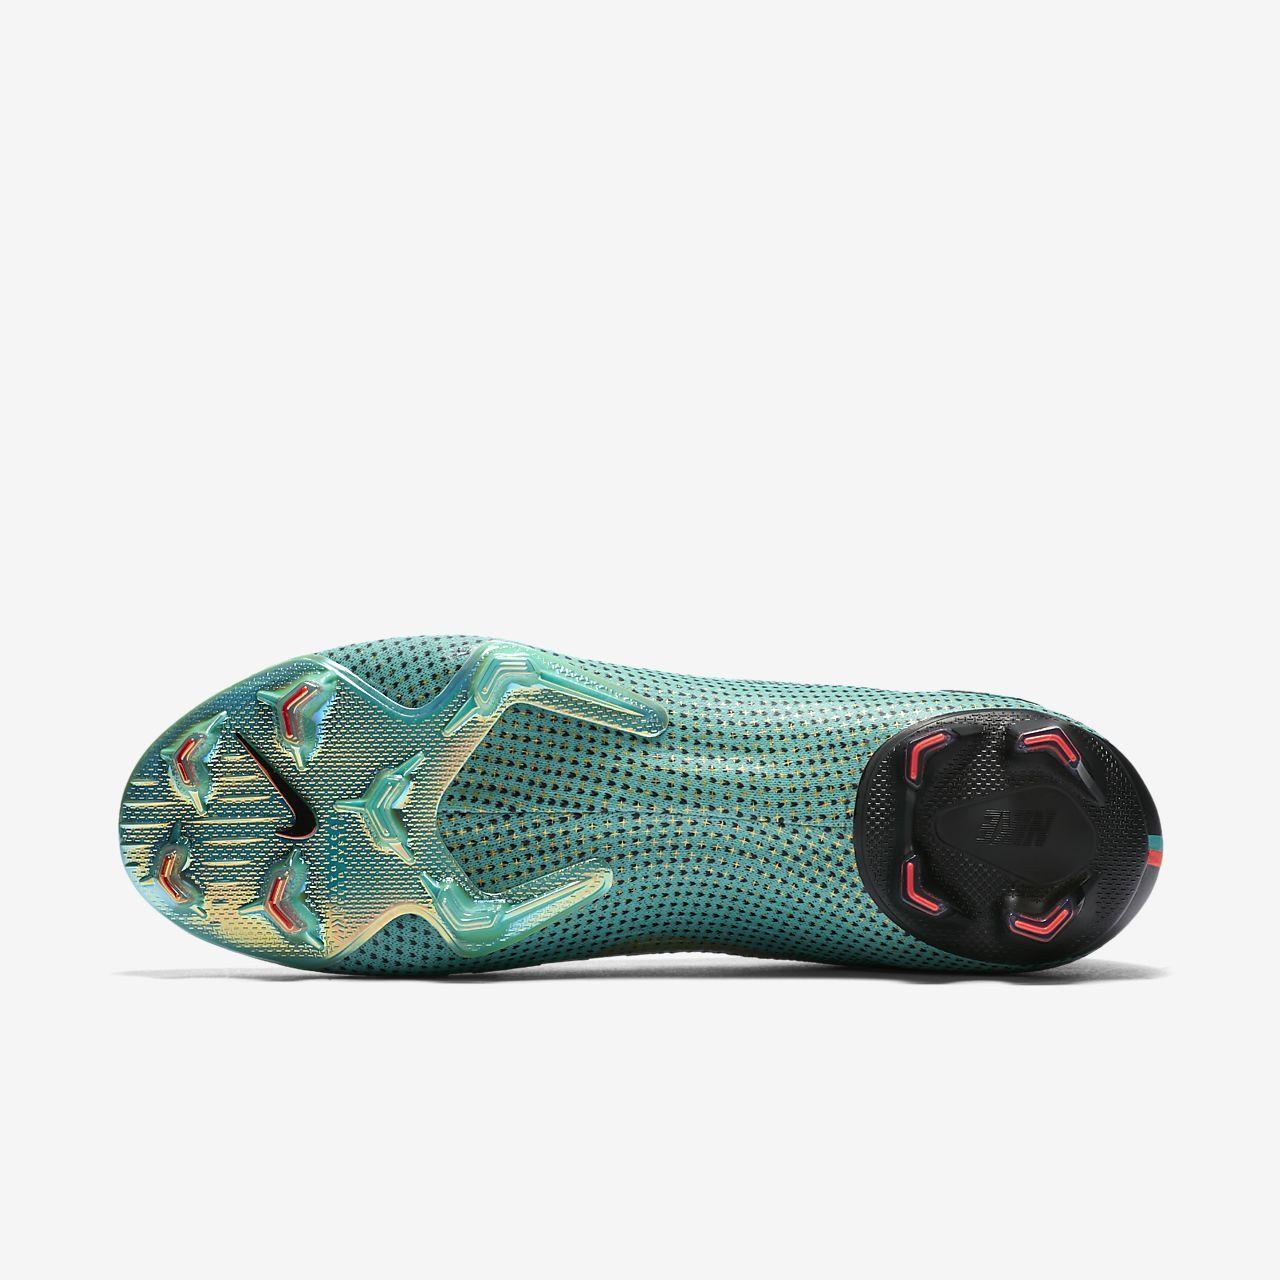 Nike Mercurial Superfly 360 Elite Cr7 Fussballschuh Fur